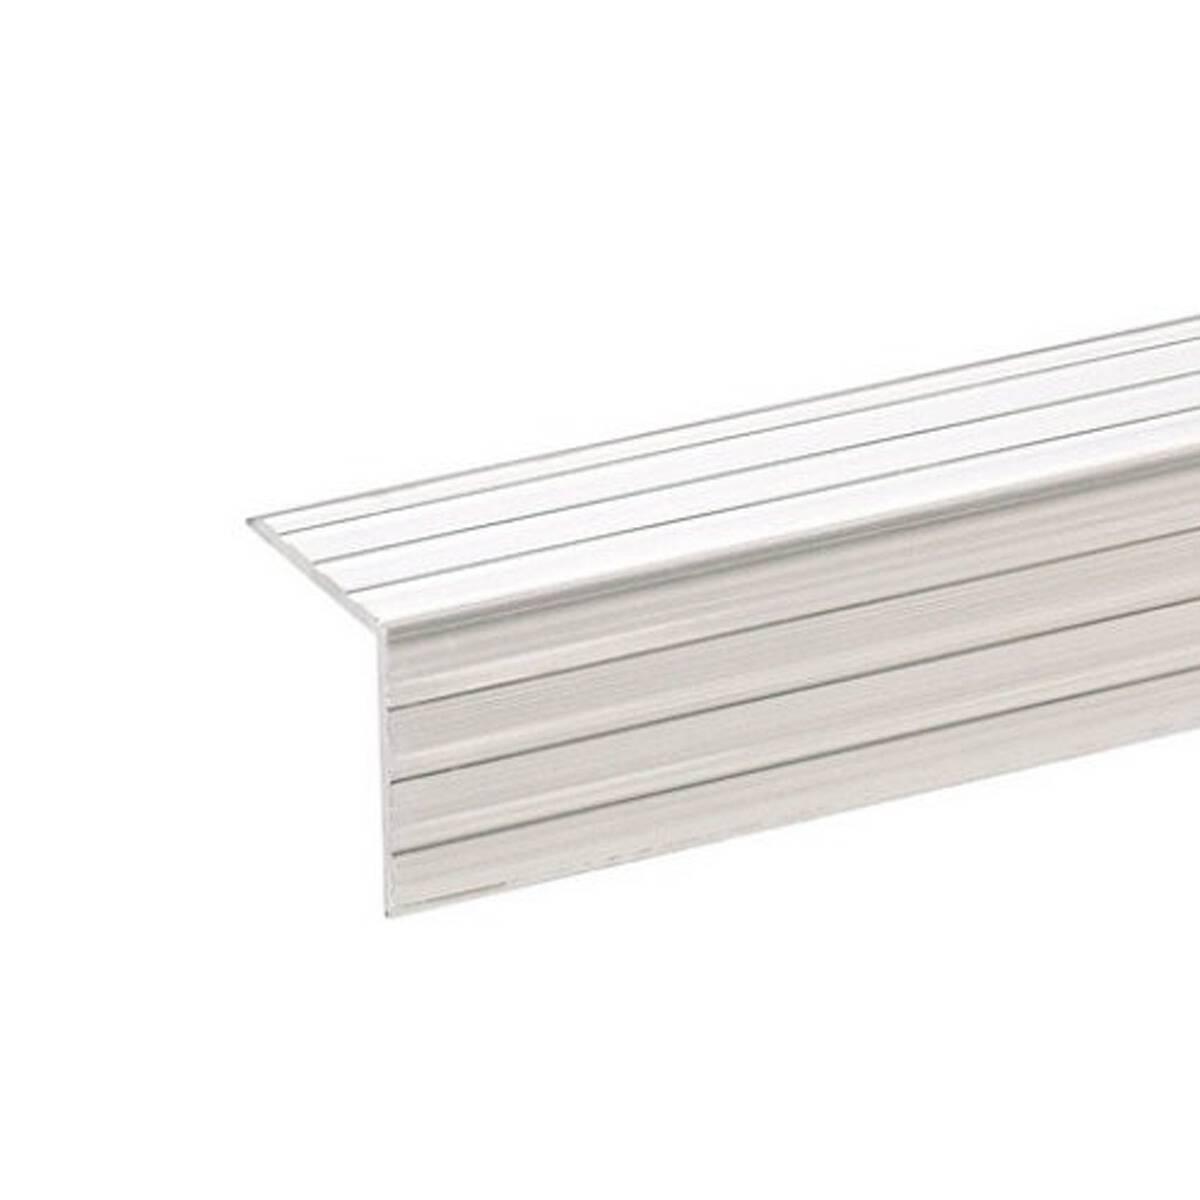 adam hall 6115 aluminium kantenschutz 25x25 mm casebau. Black Bedroom Furniture Sets. Home Design Ideas